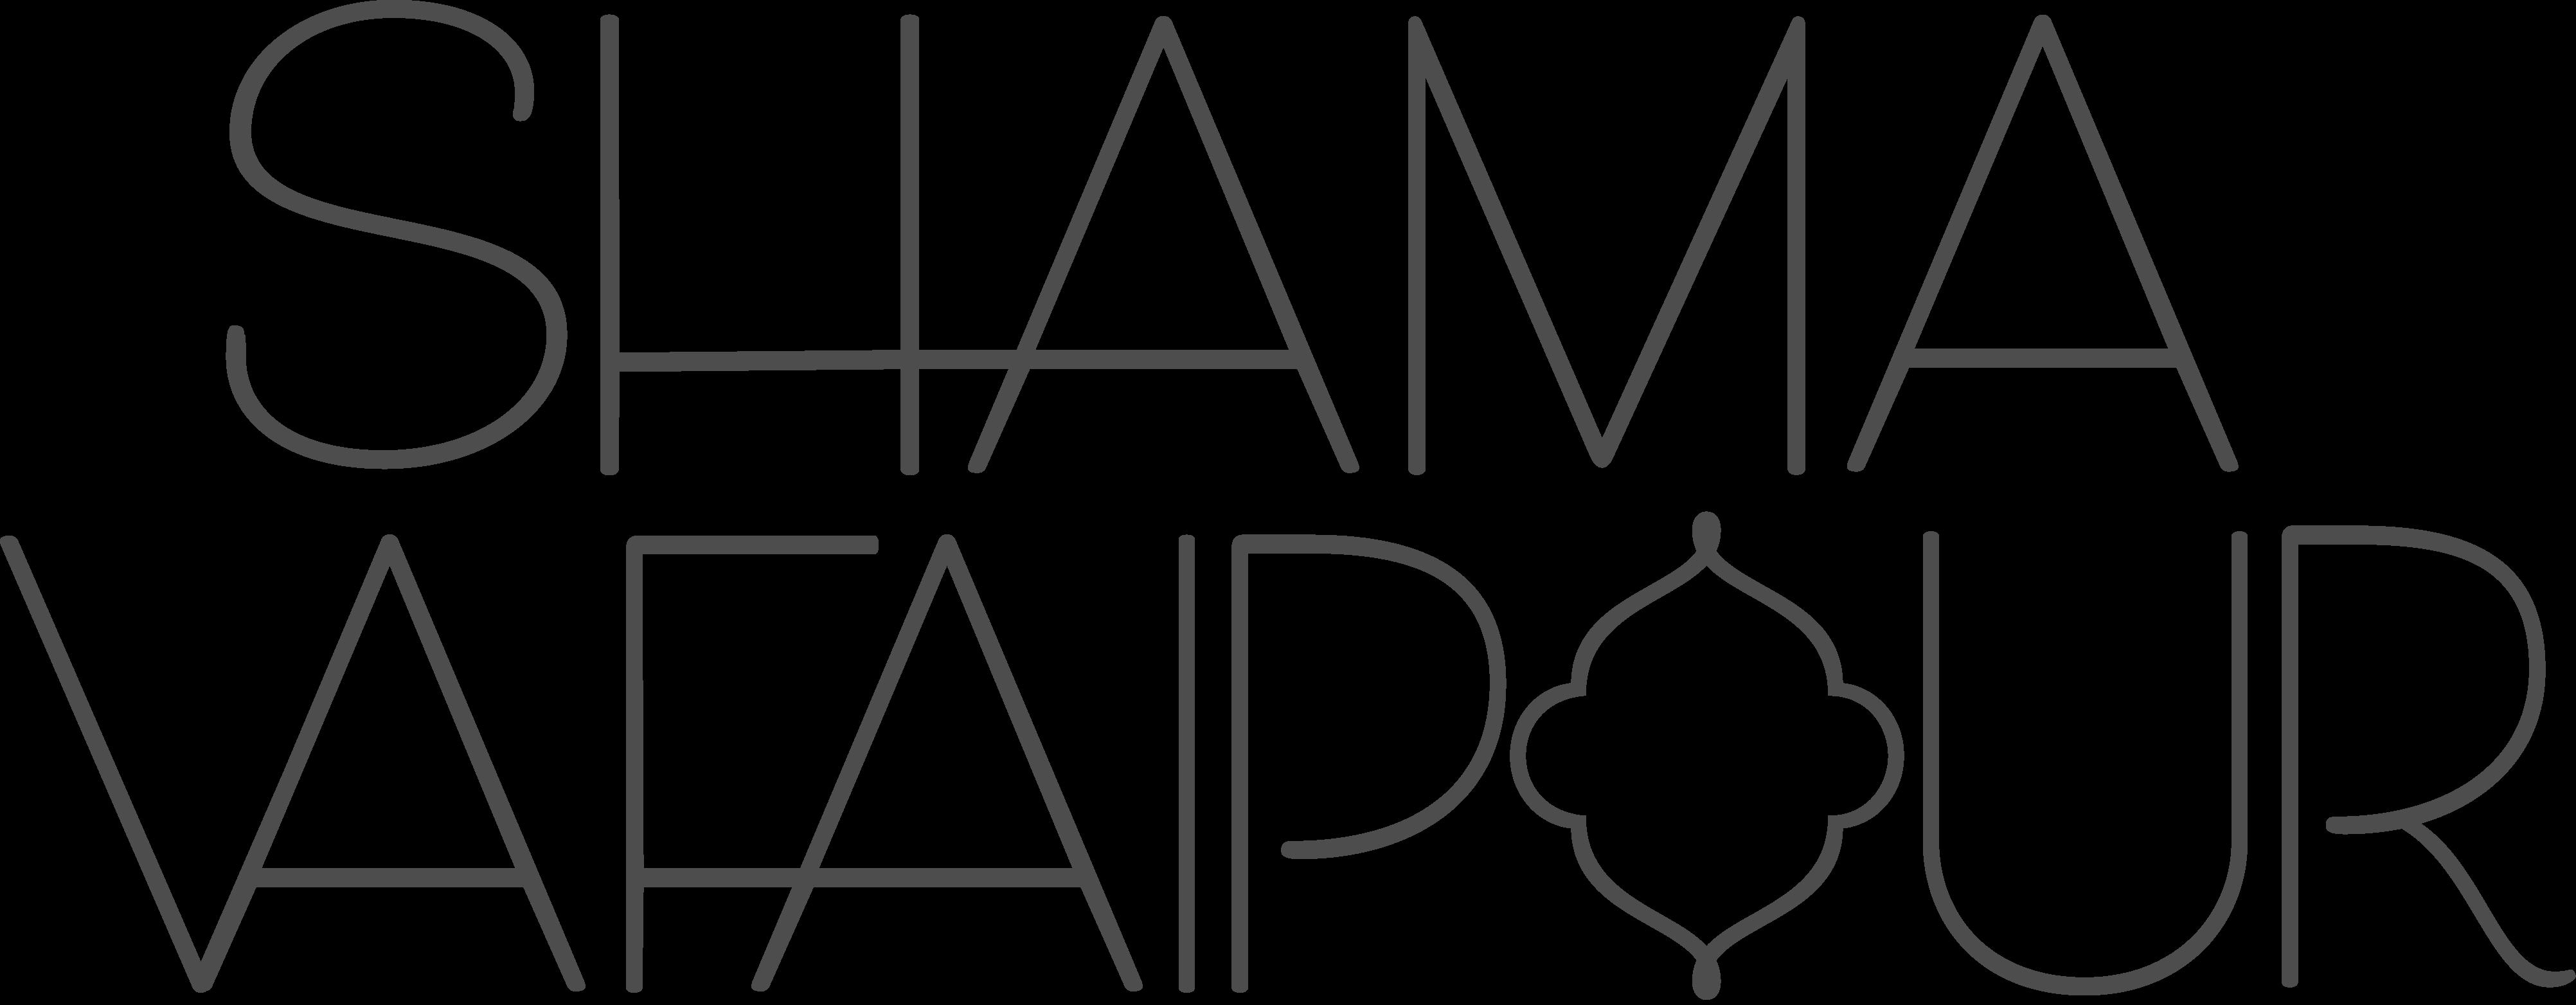 Shama Vafaipour